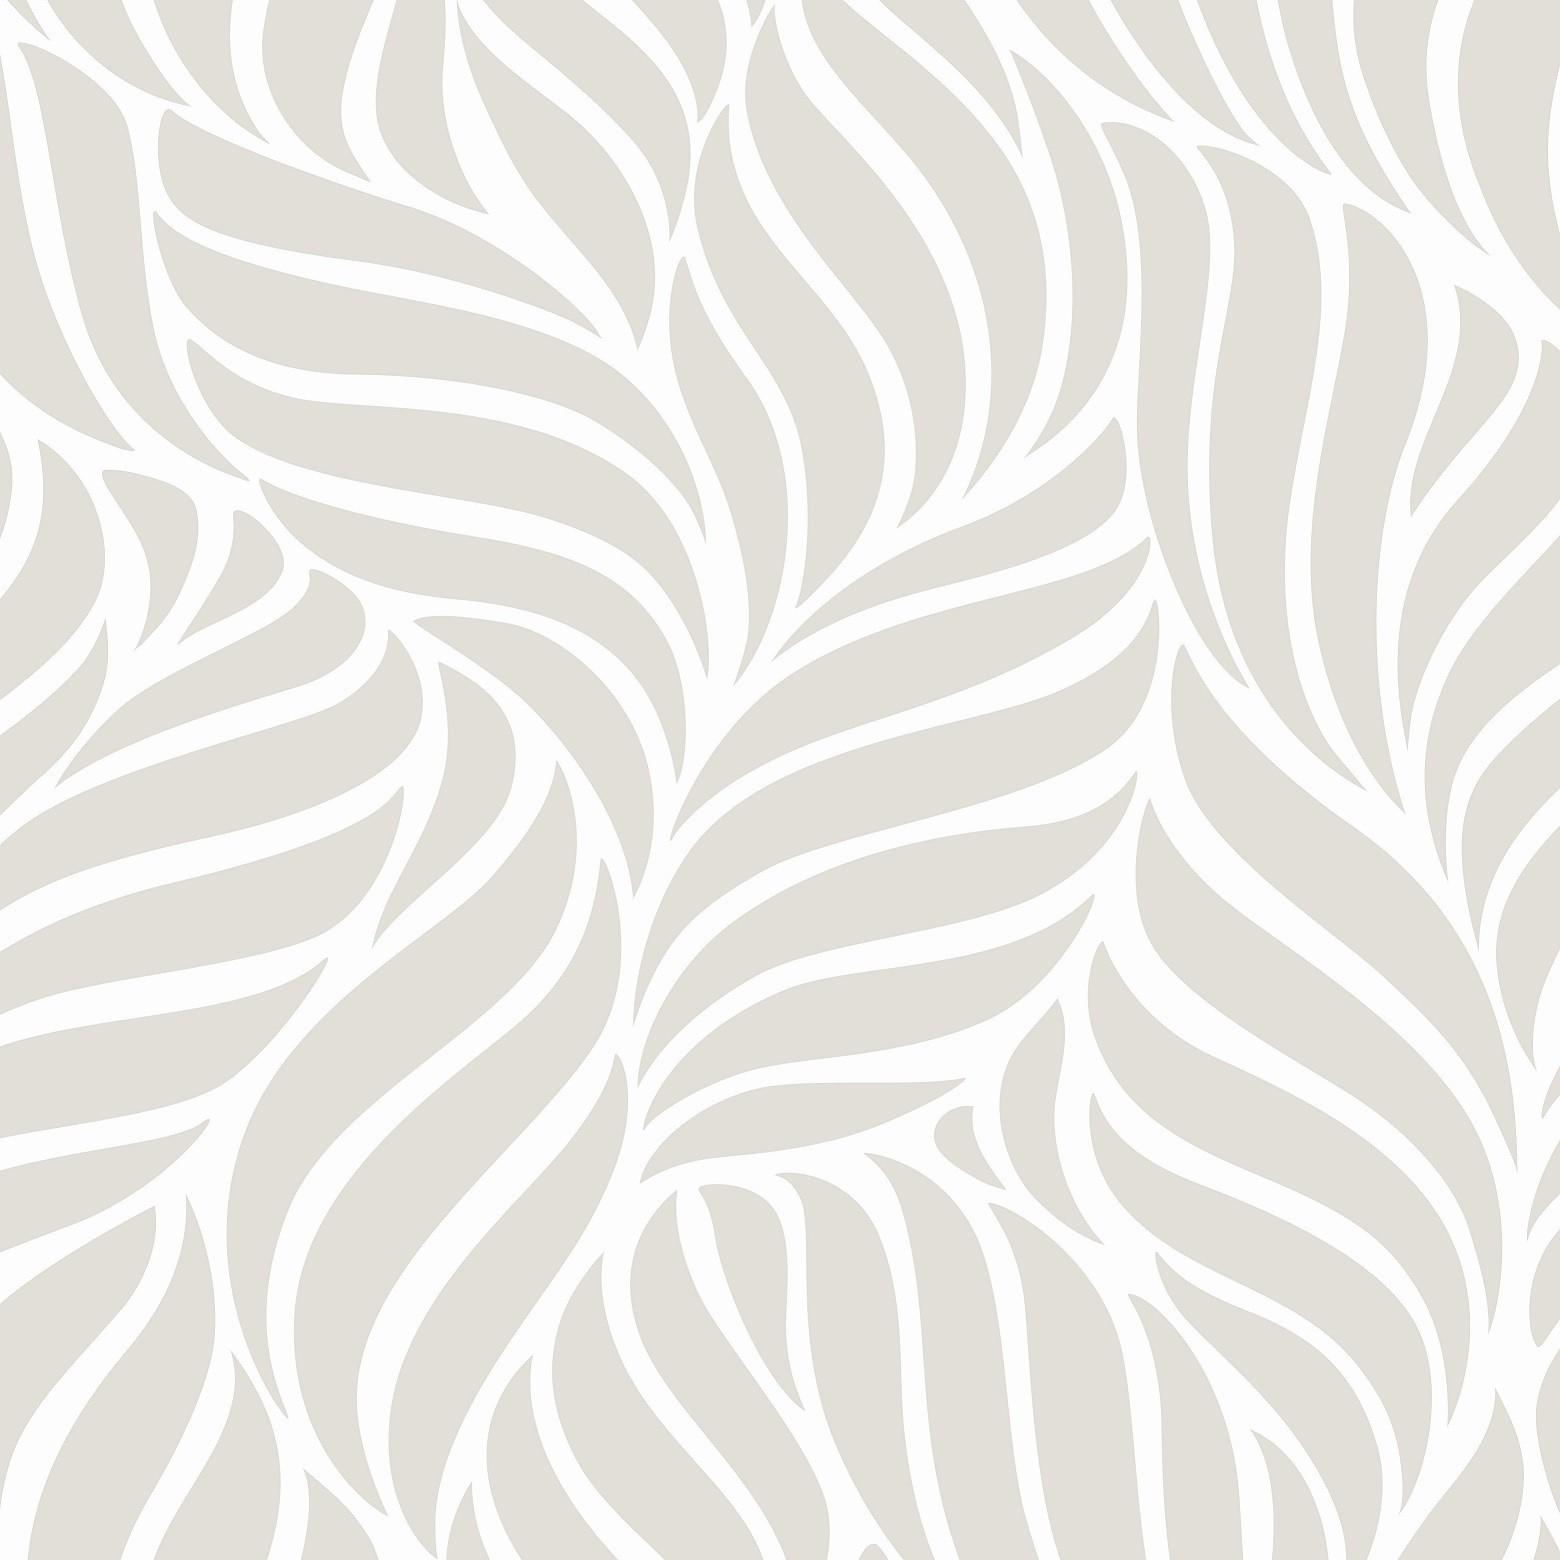 Papel de Parede ADESIVO - Folhas abstratas